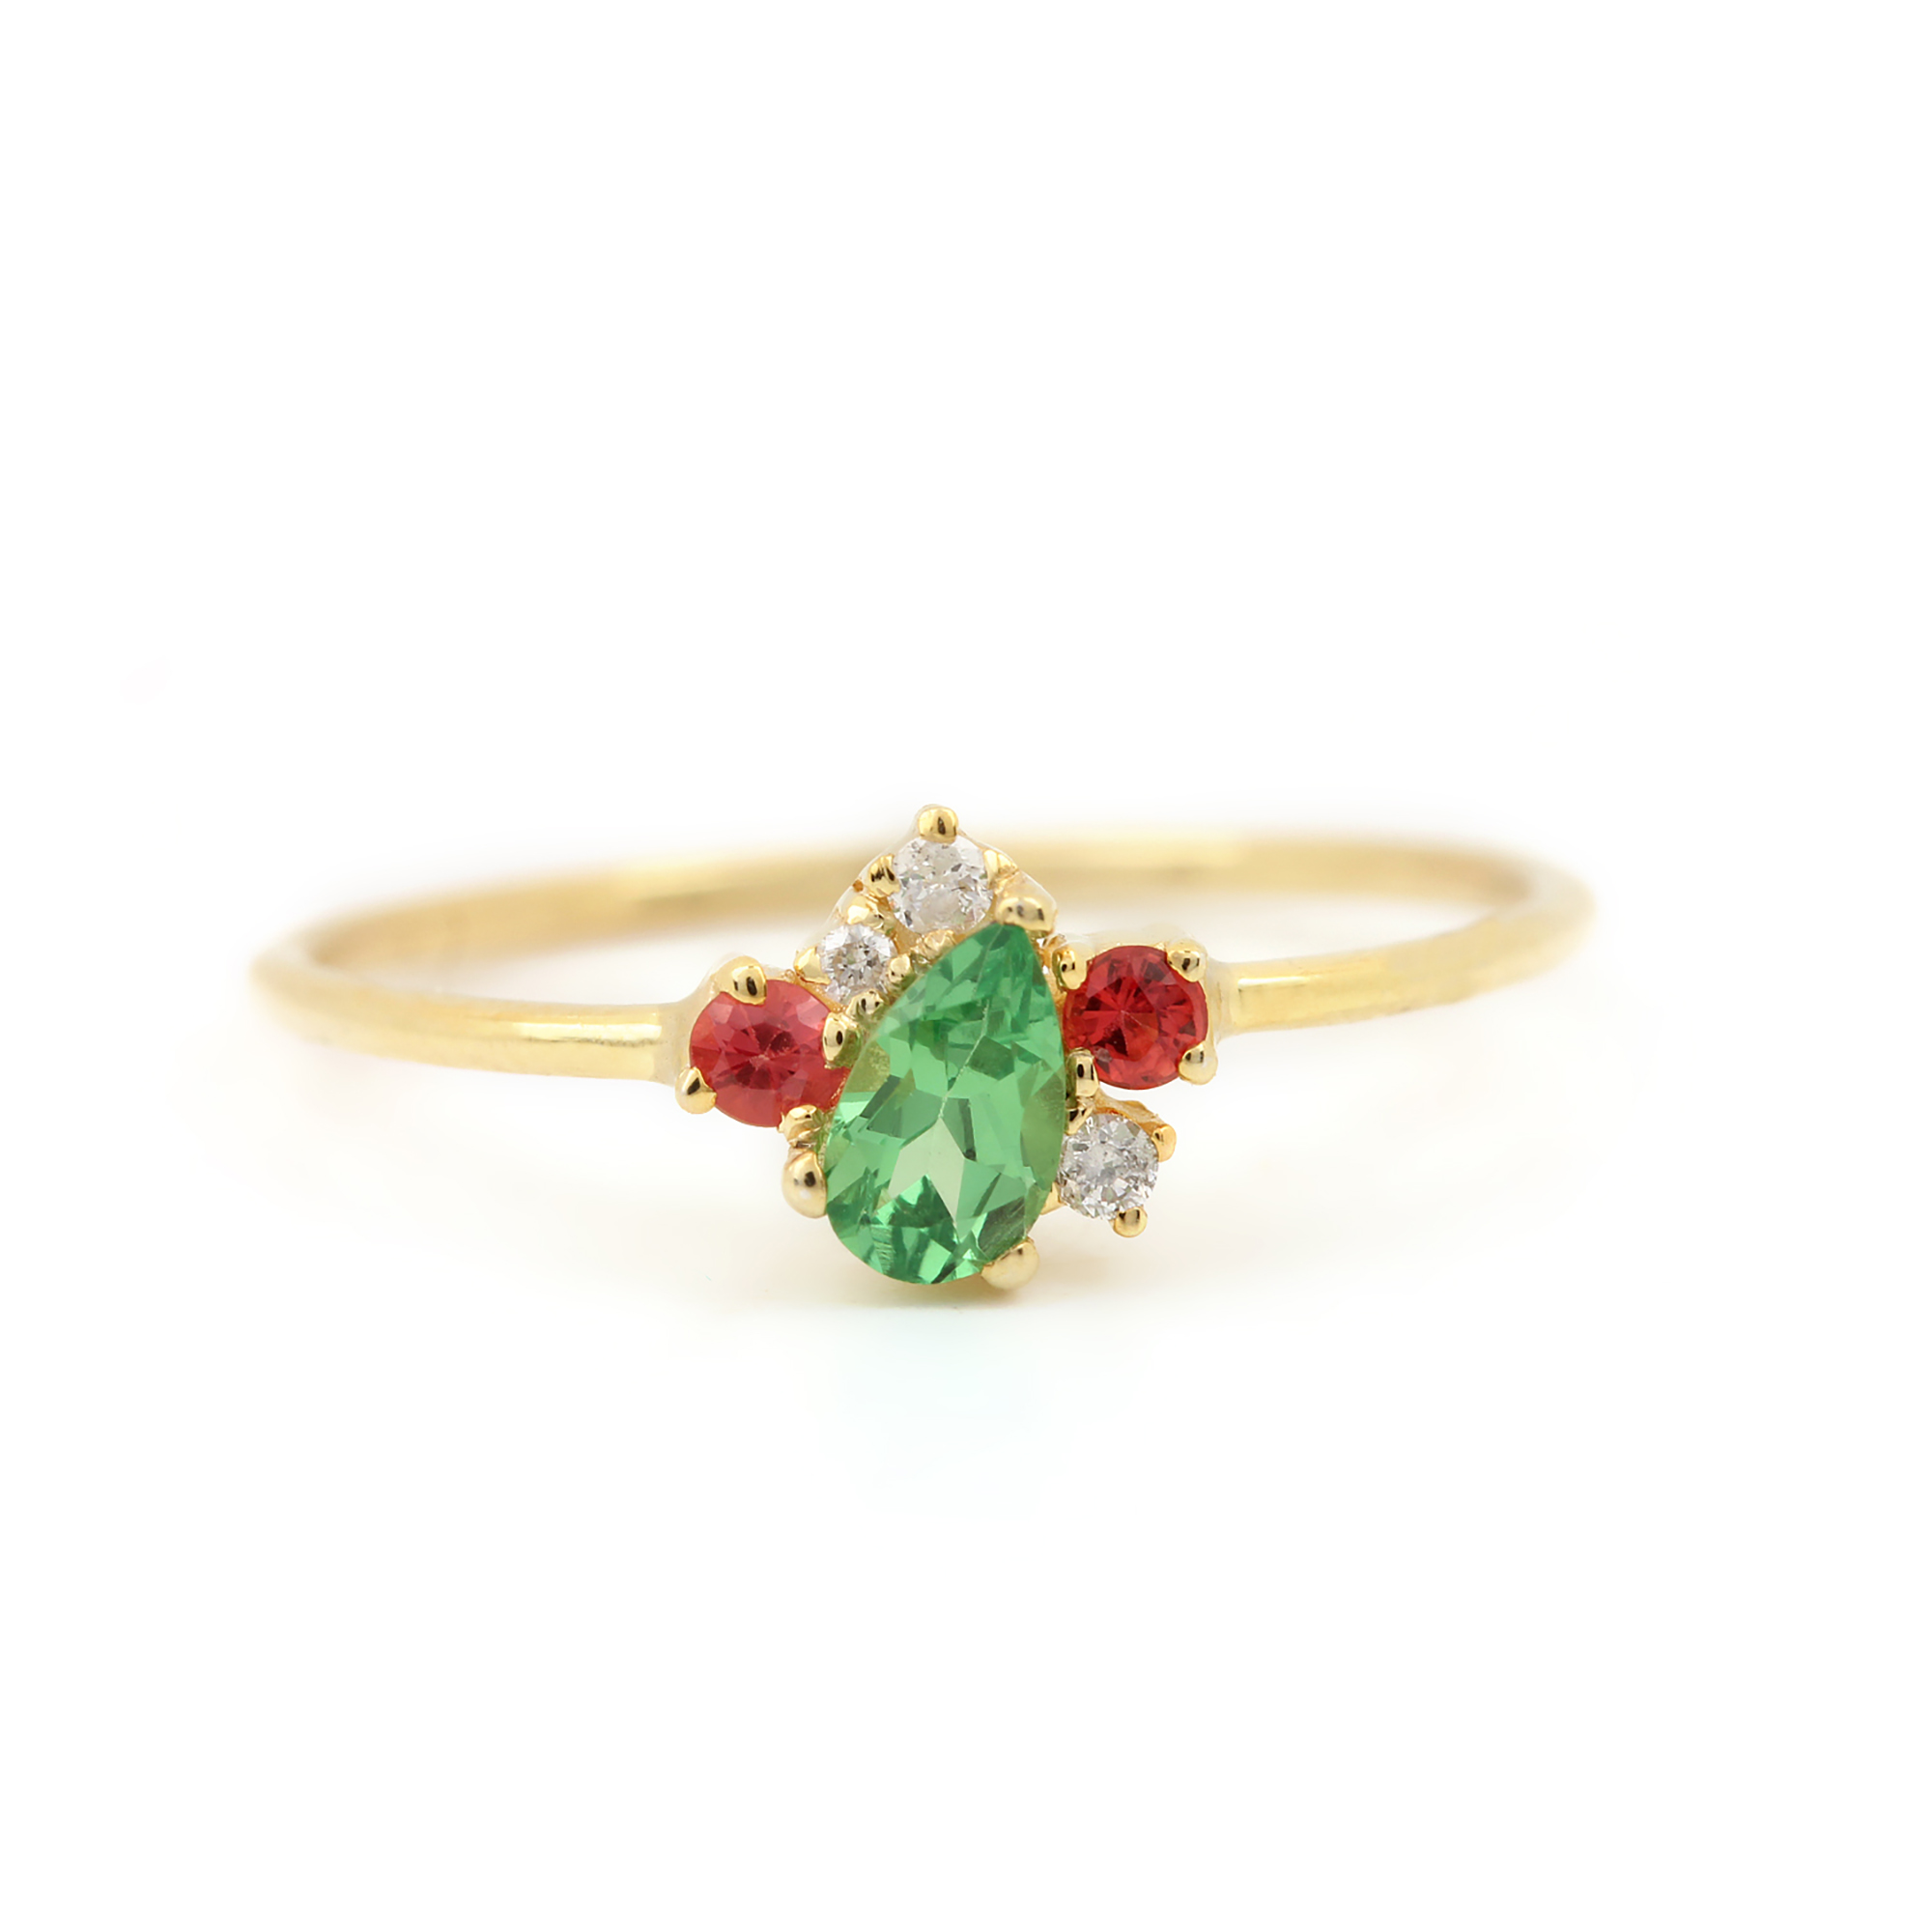 14k Solid Gold Natural Diamond Gemstone Ring